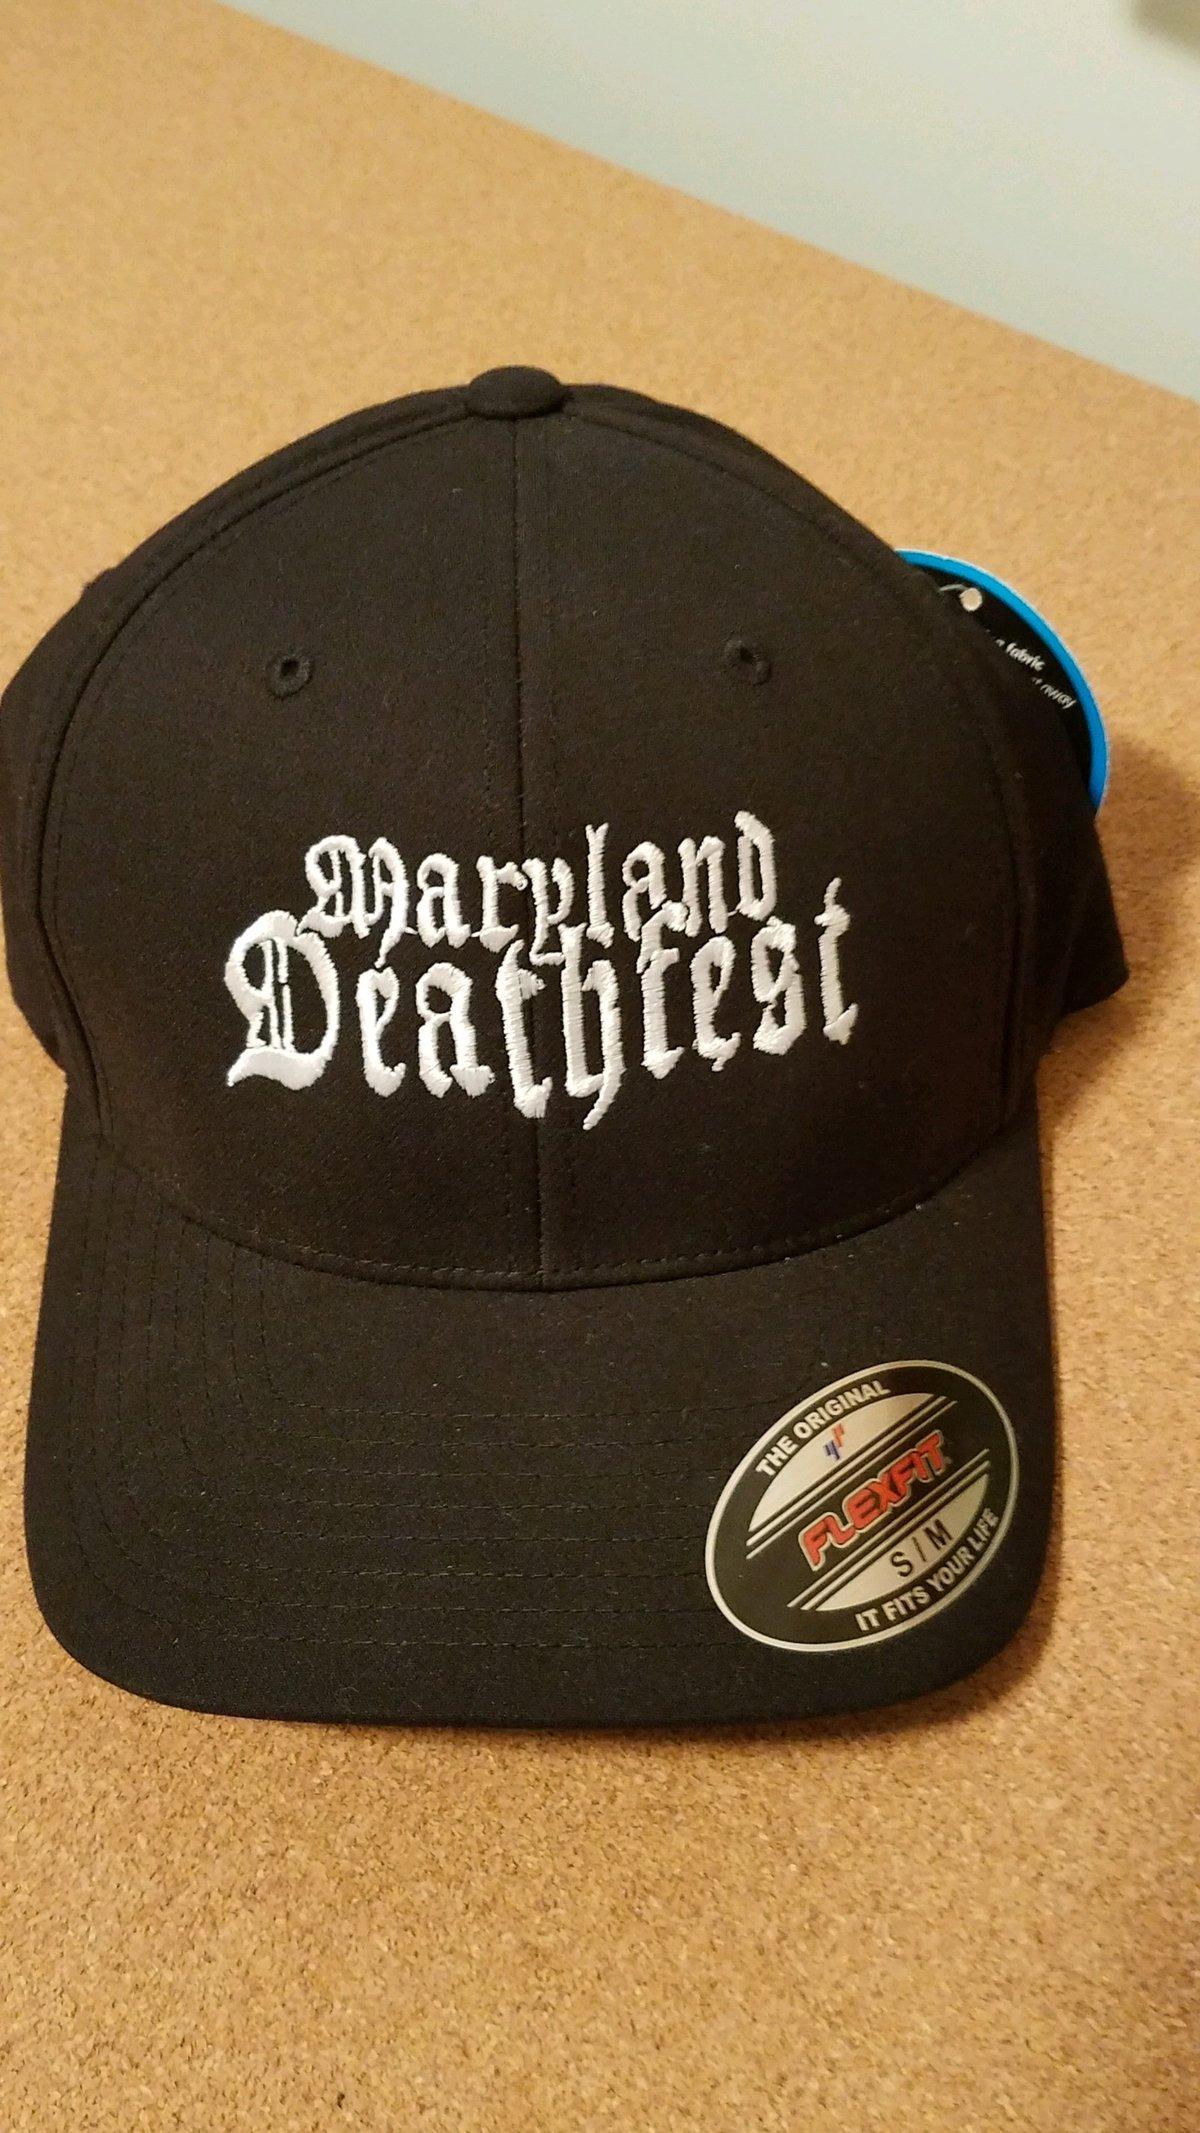 Maryland Deathfest Flexfit cap